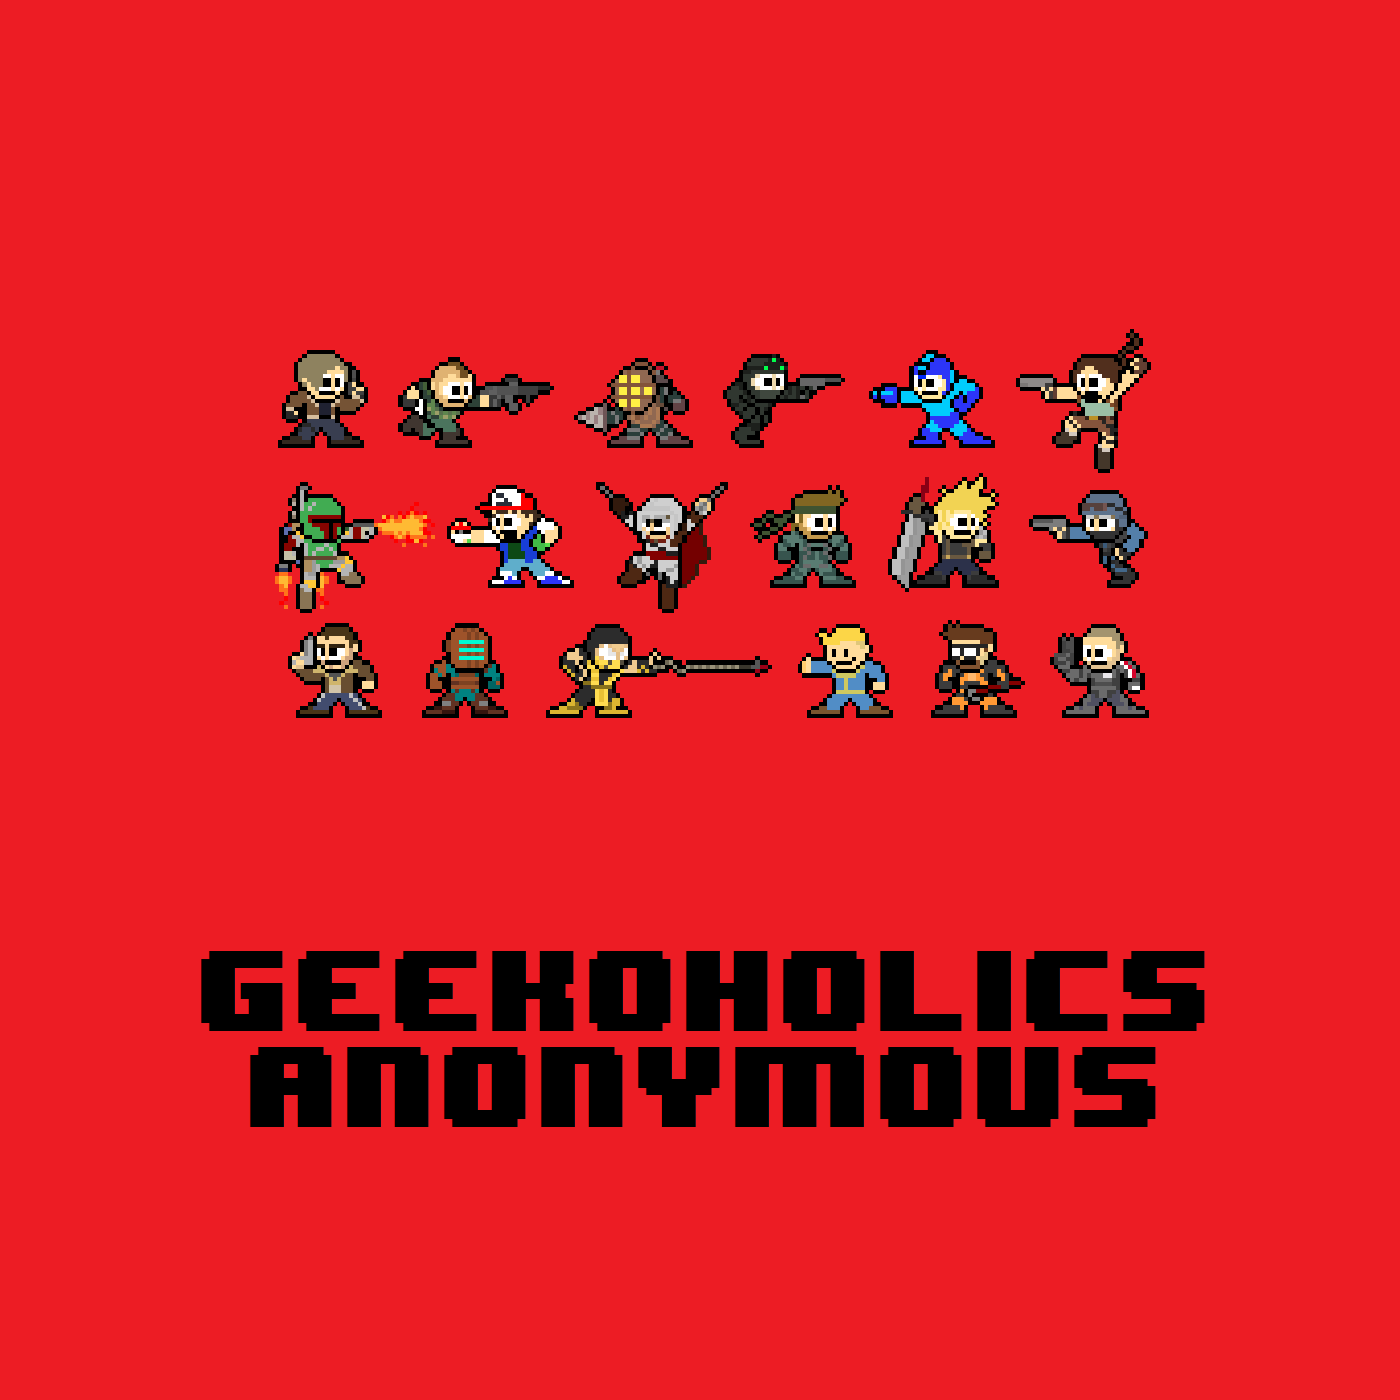 Biomutant, Miitopia, Sekiro, The Bad Batch and more - Geekoholics Anonymous Podcast 307 show art